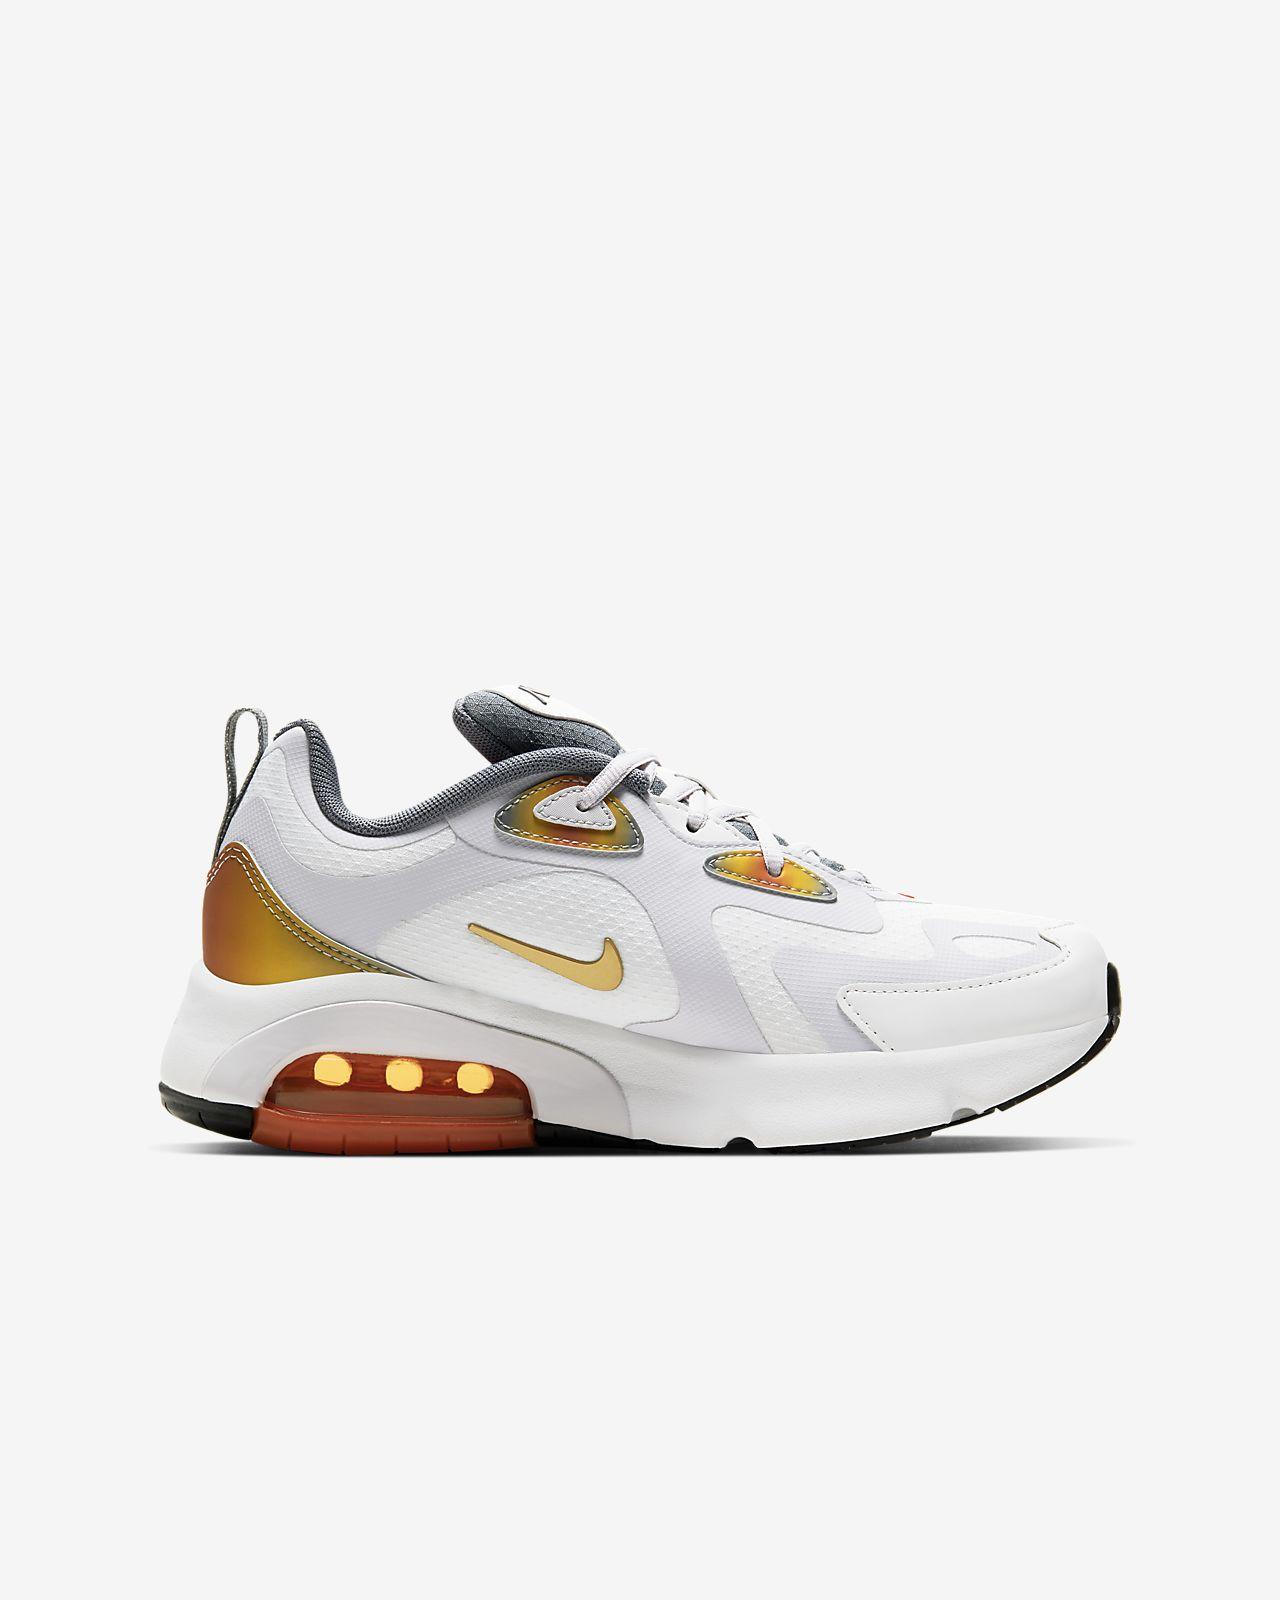 Nike Air Max 200 SE Schuh für ältere Kinder